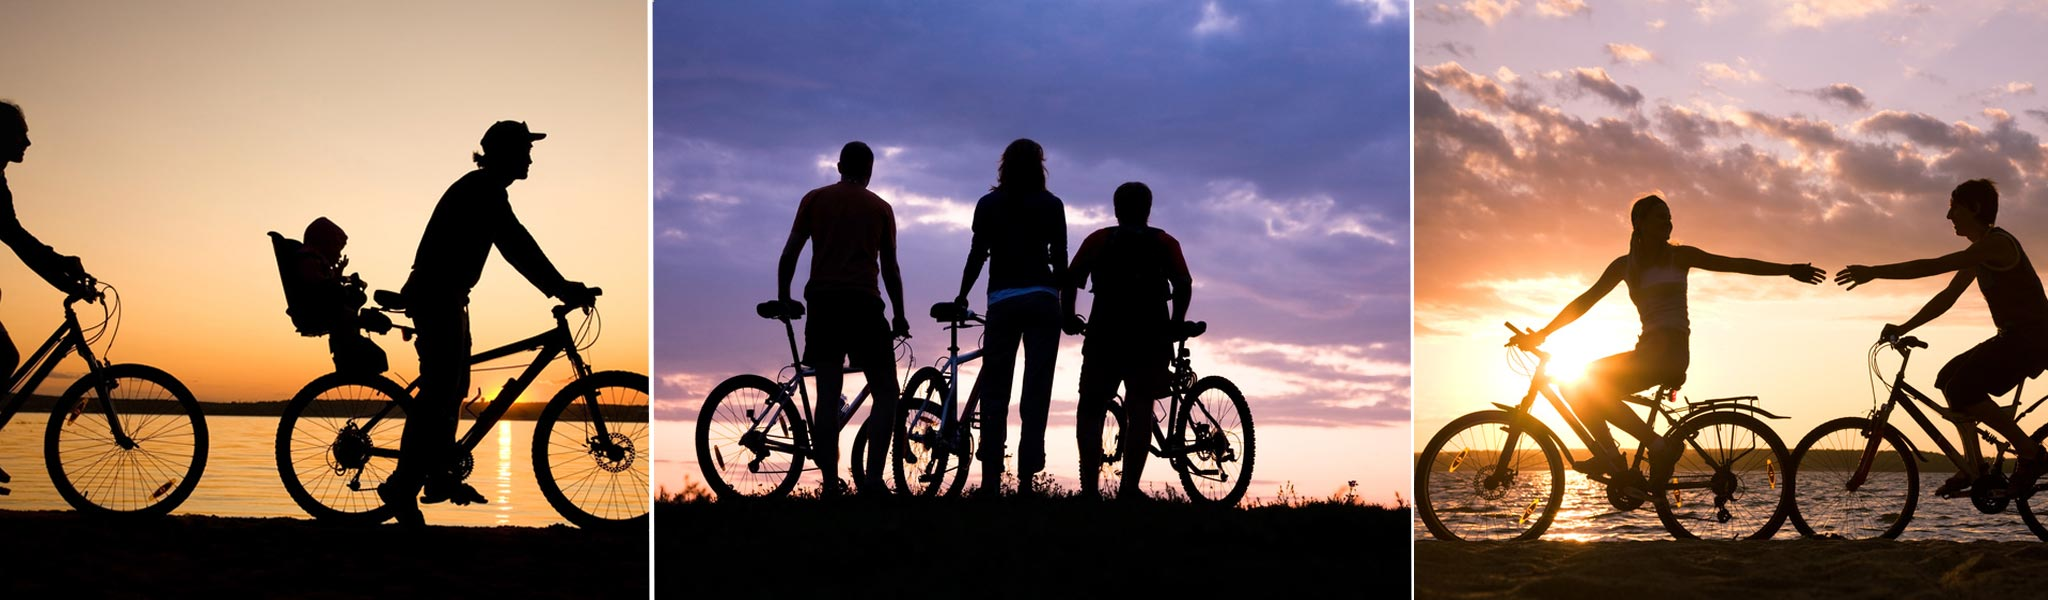 biking on marthas vineyard